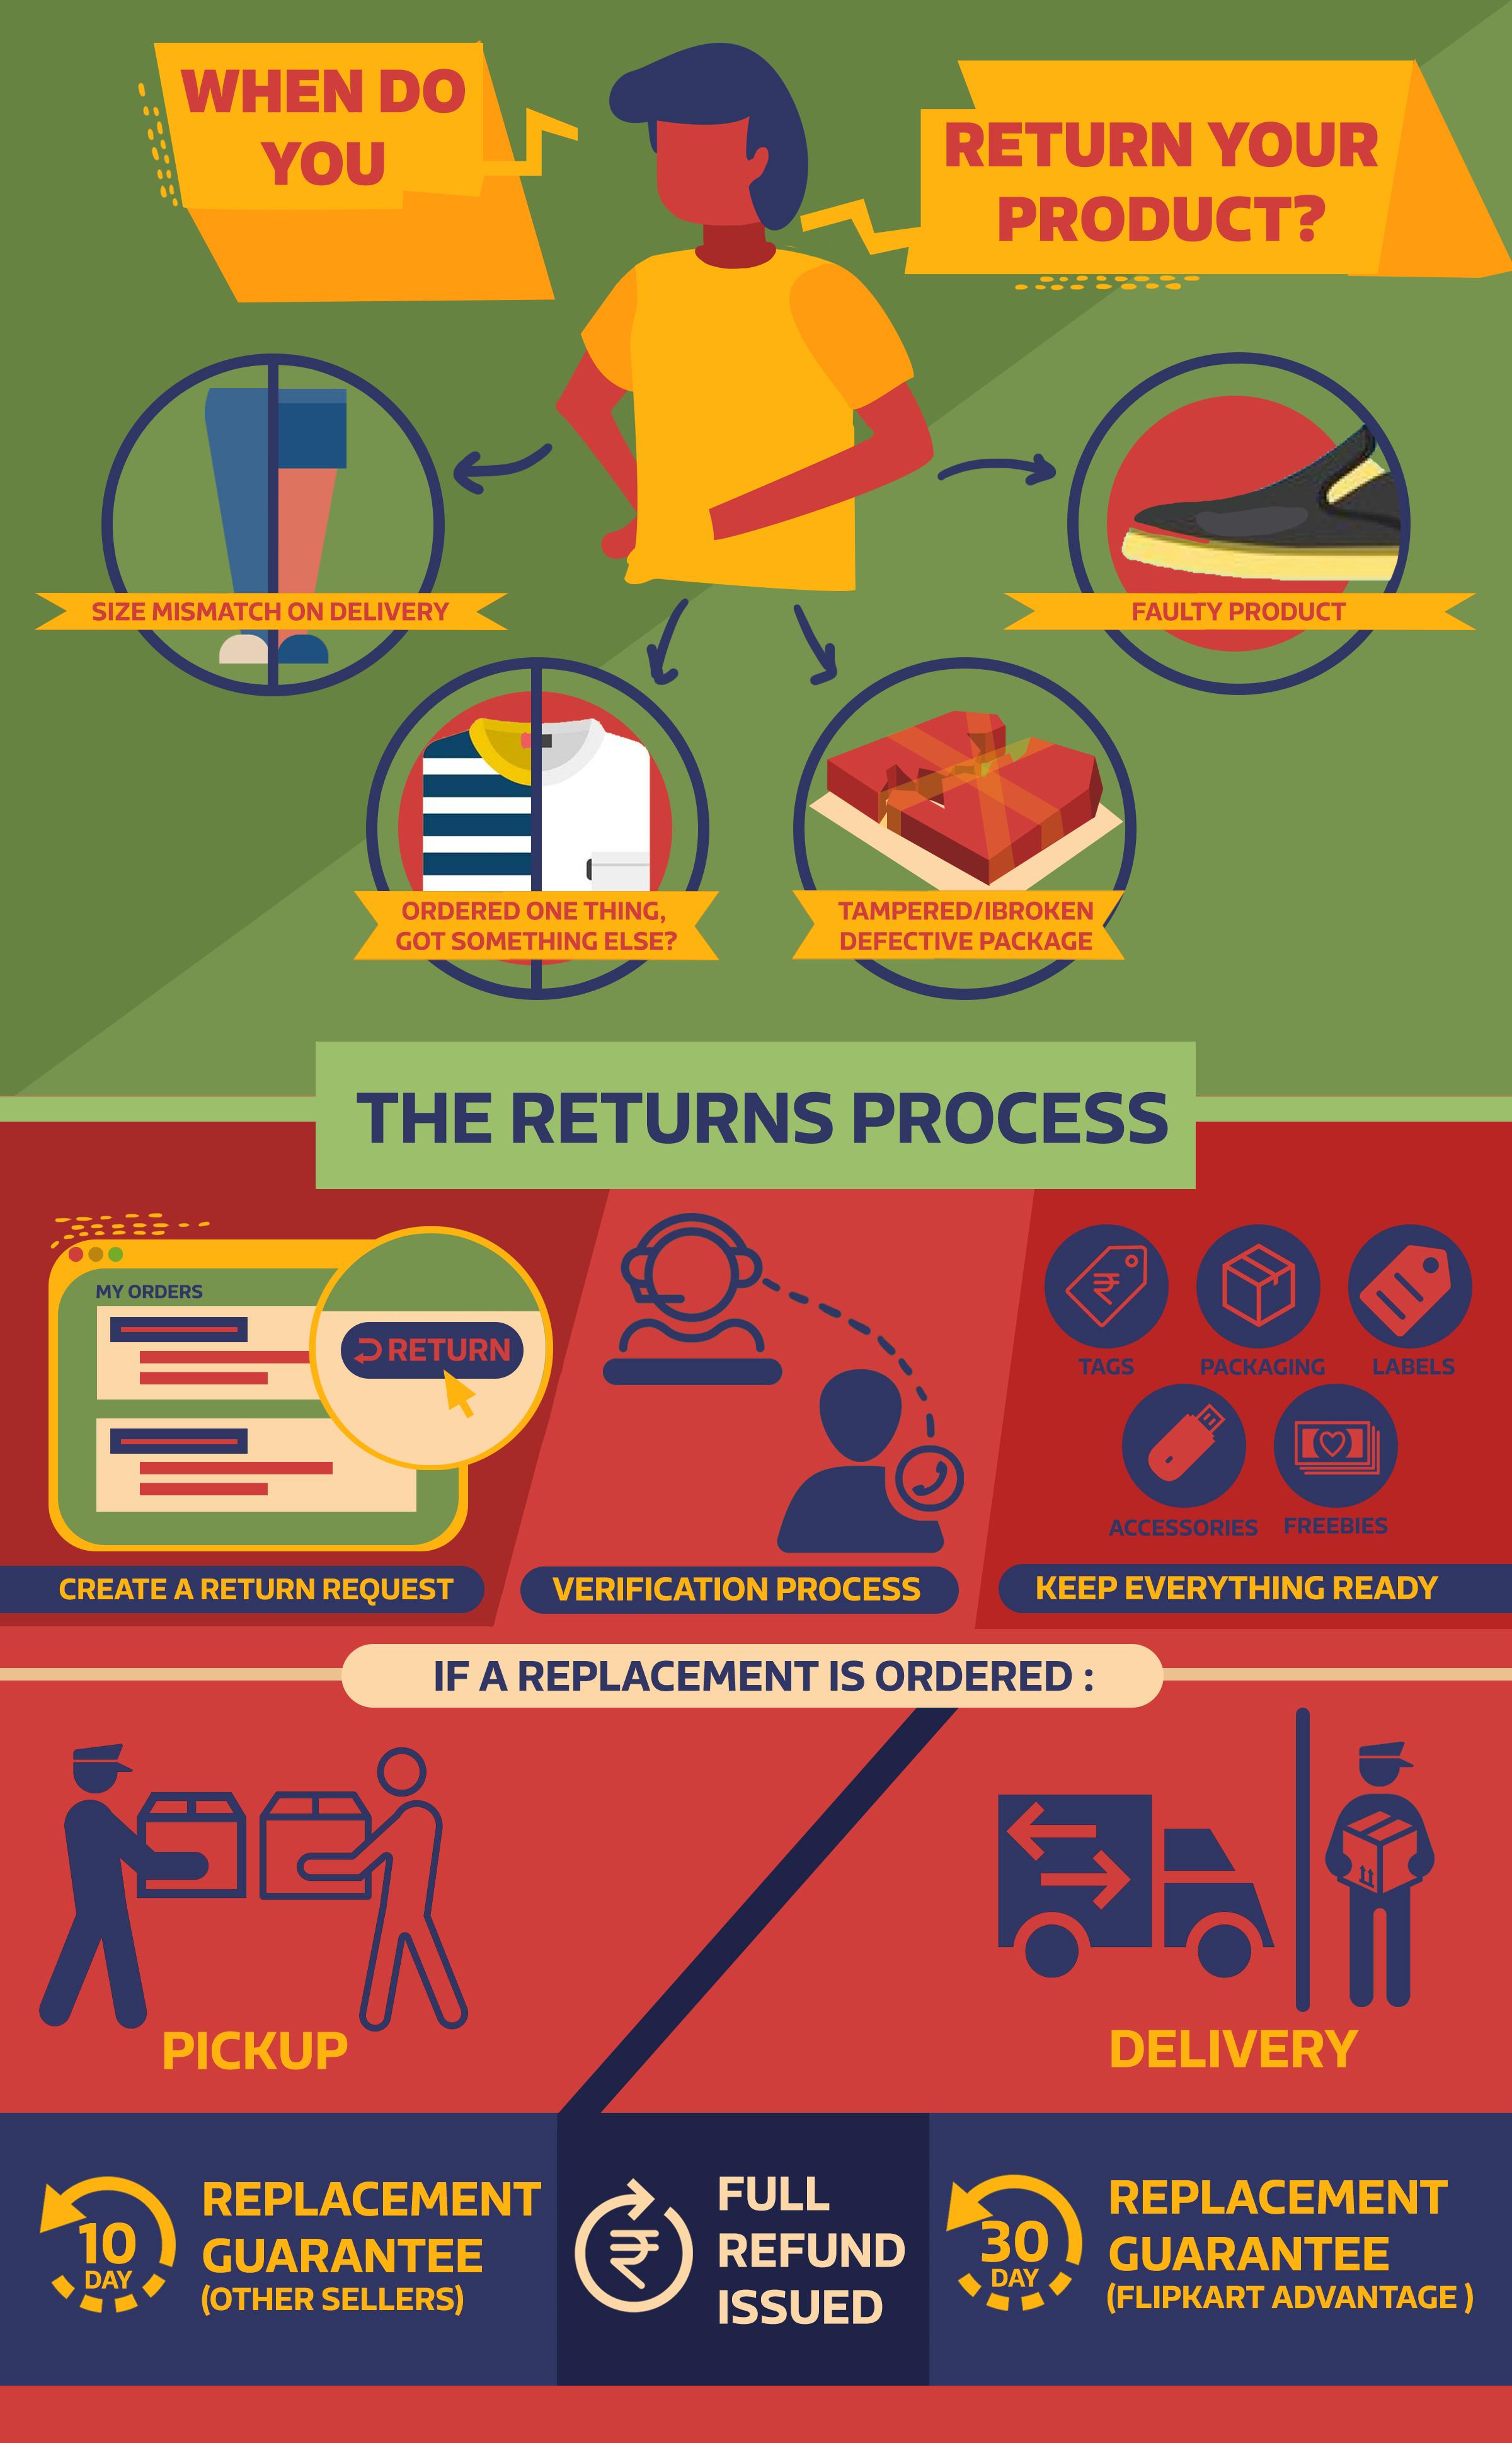 Flipkart Product Returns Process Explained